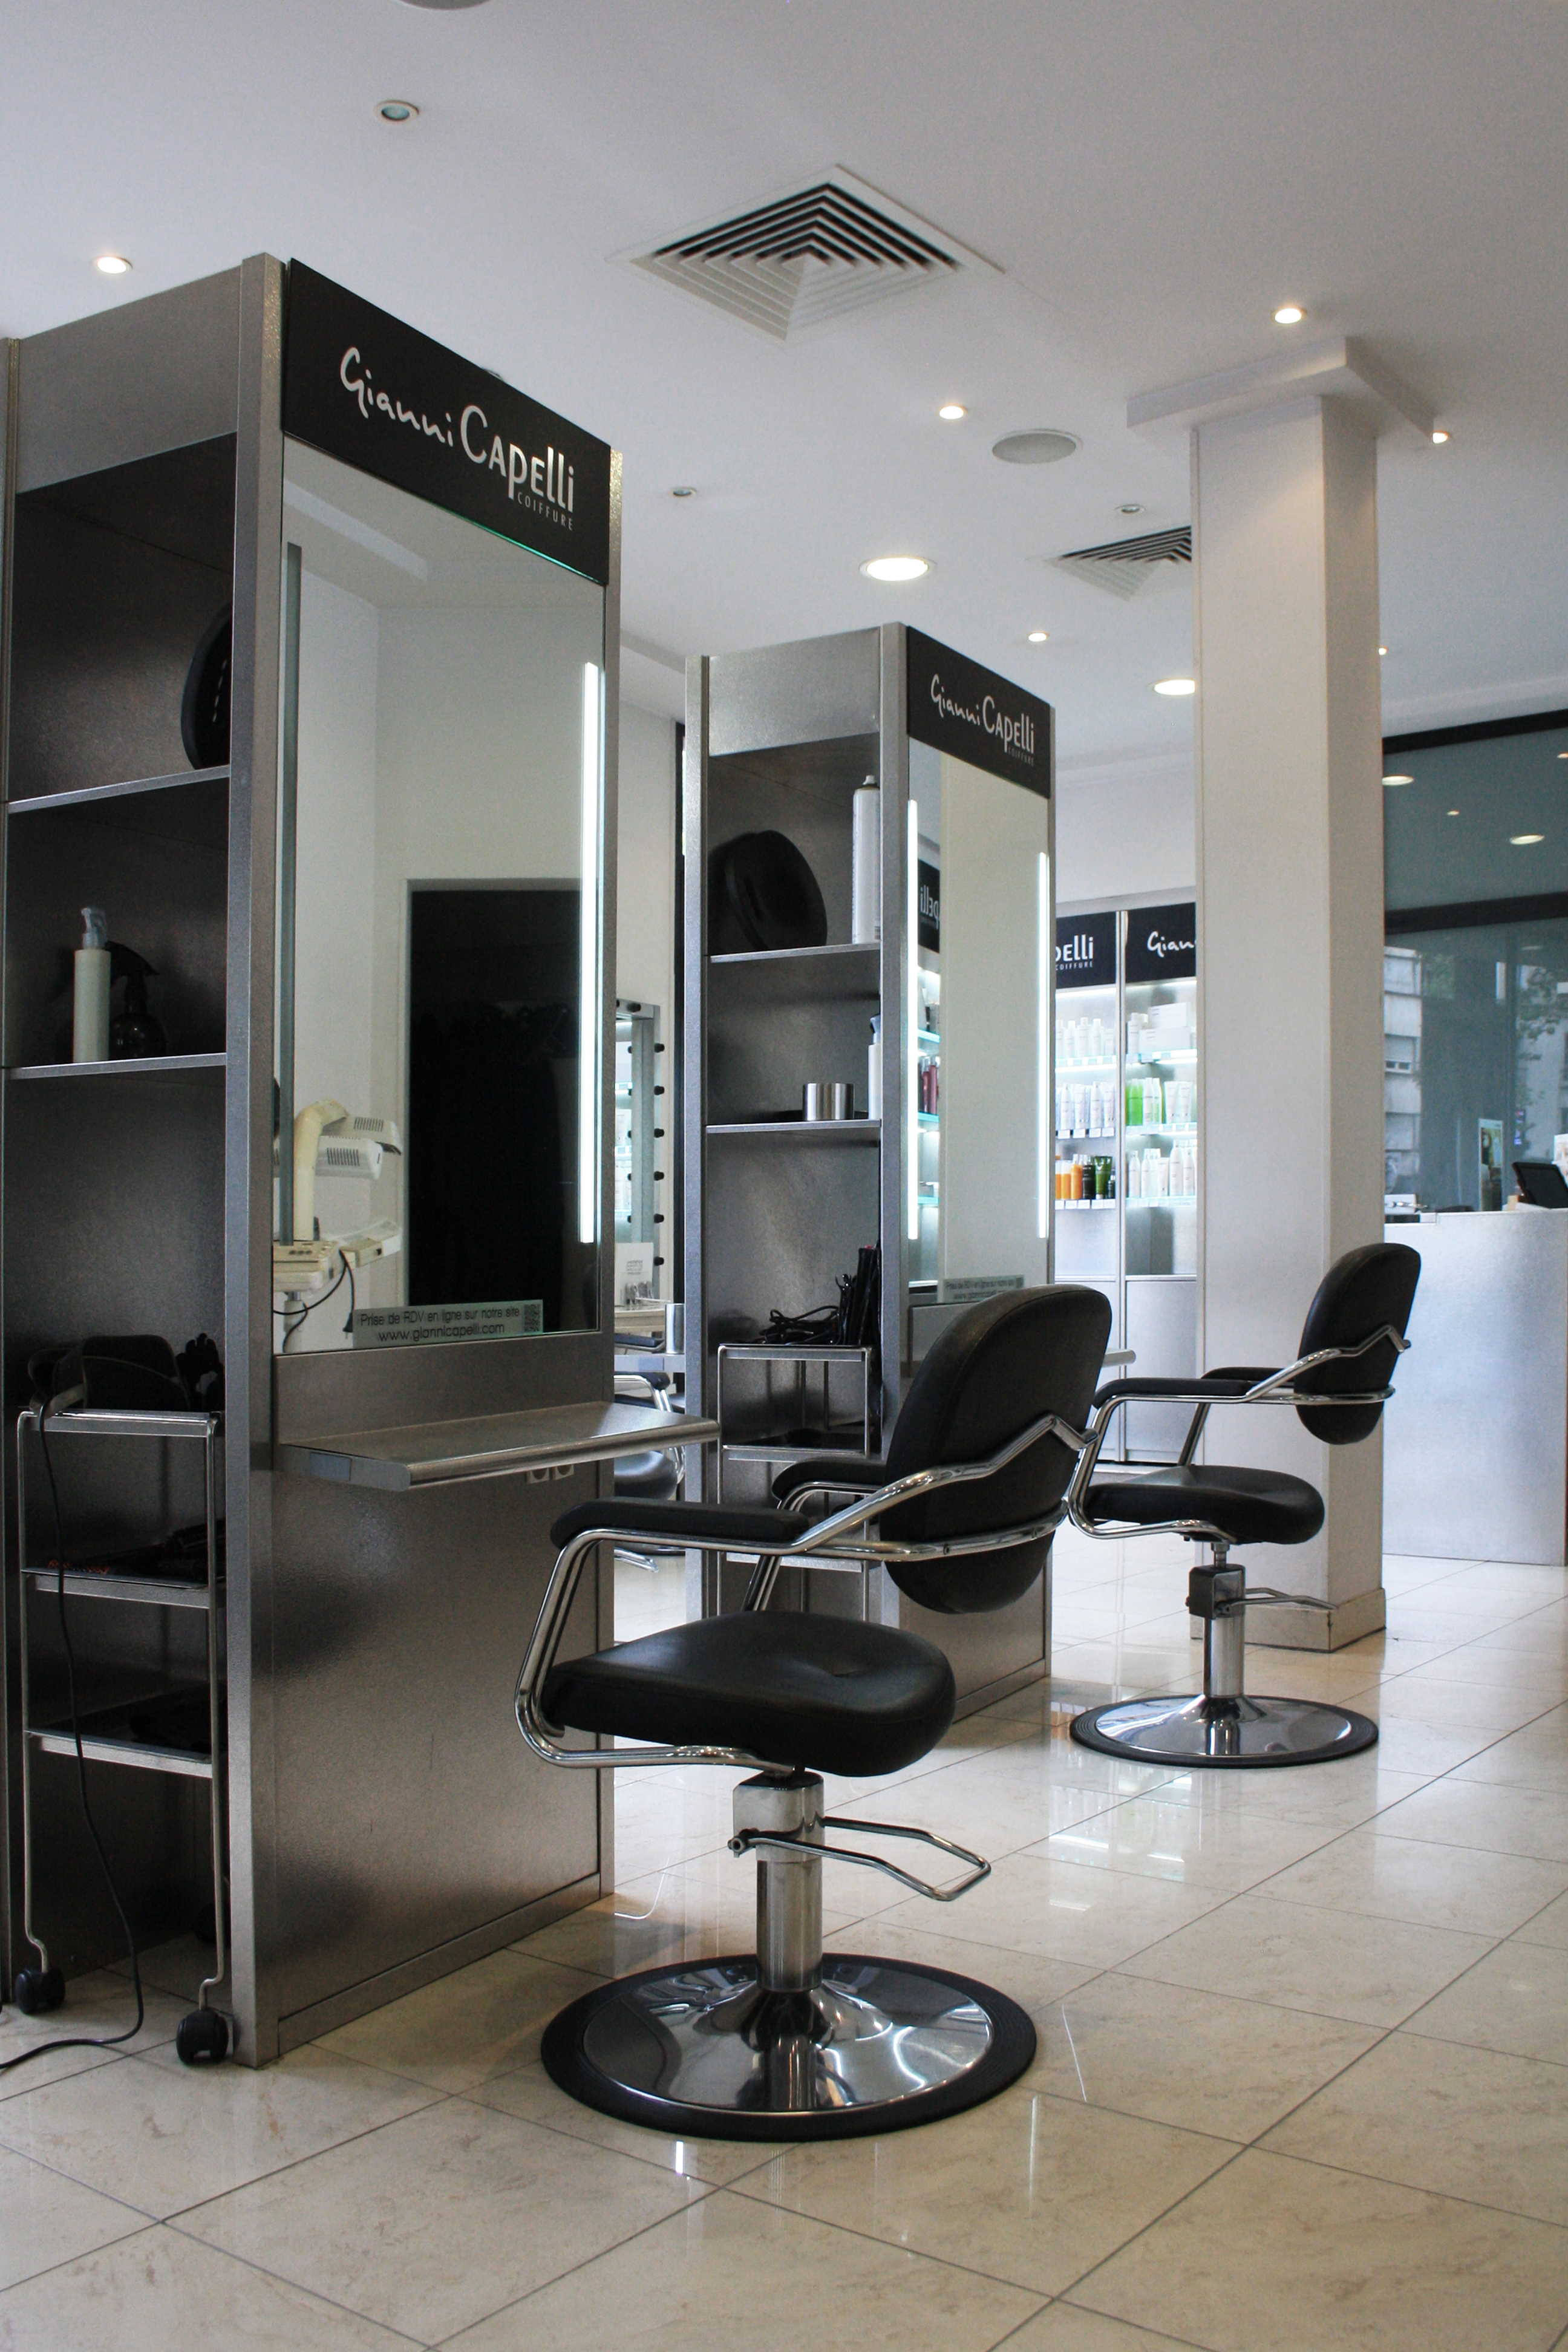 Gianni capelli boulogne billancourt avis tarifs for Salon de coiffure boulogne billancourt